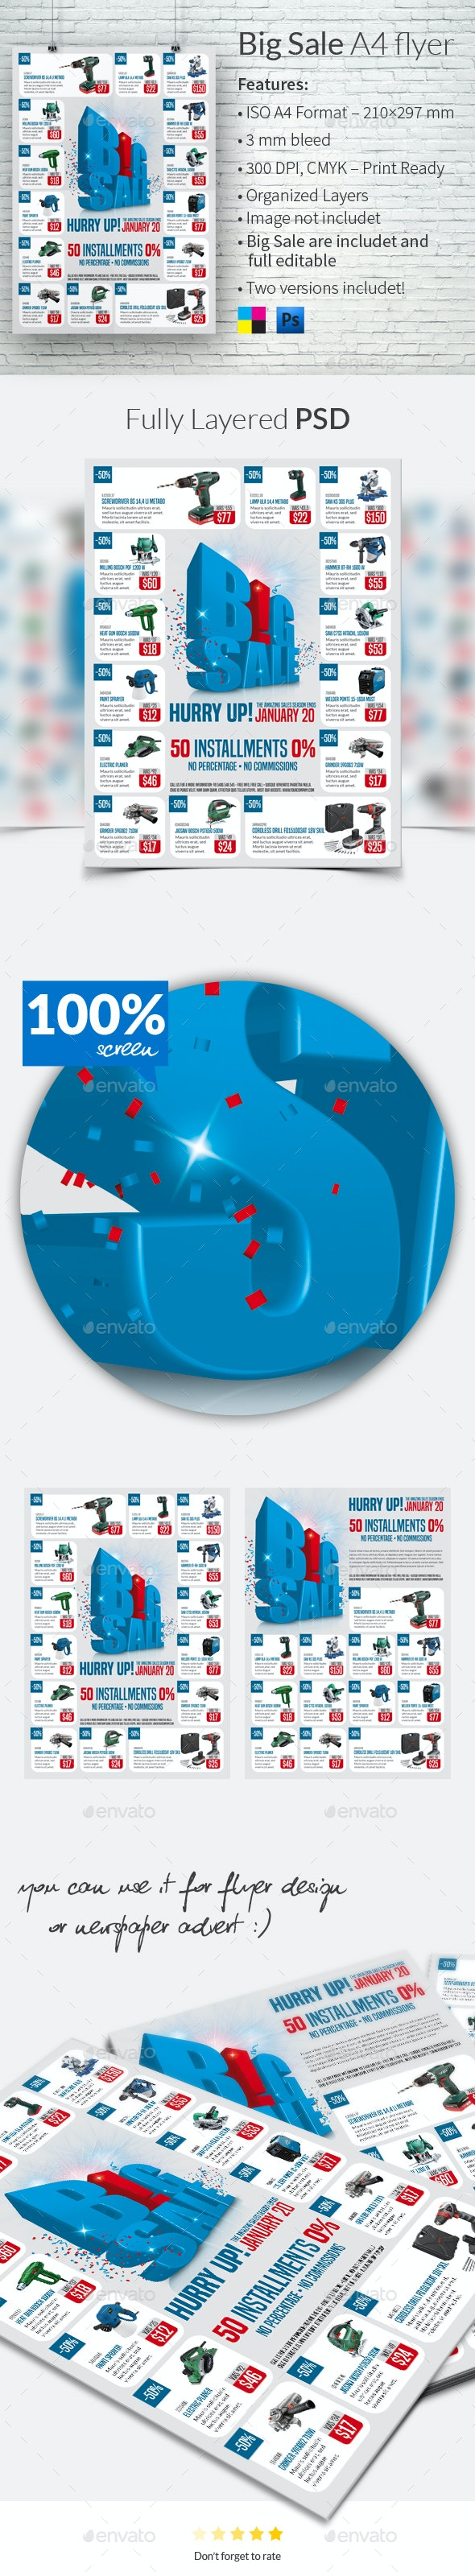 Big Sale A4 Flyer Template - Flyers Print Templates